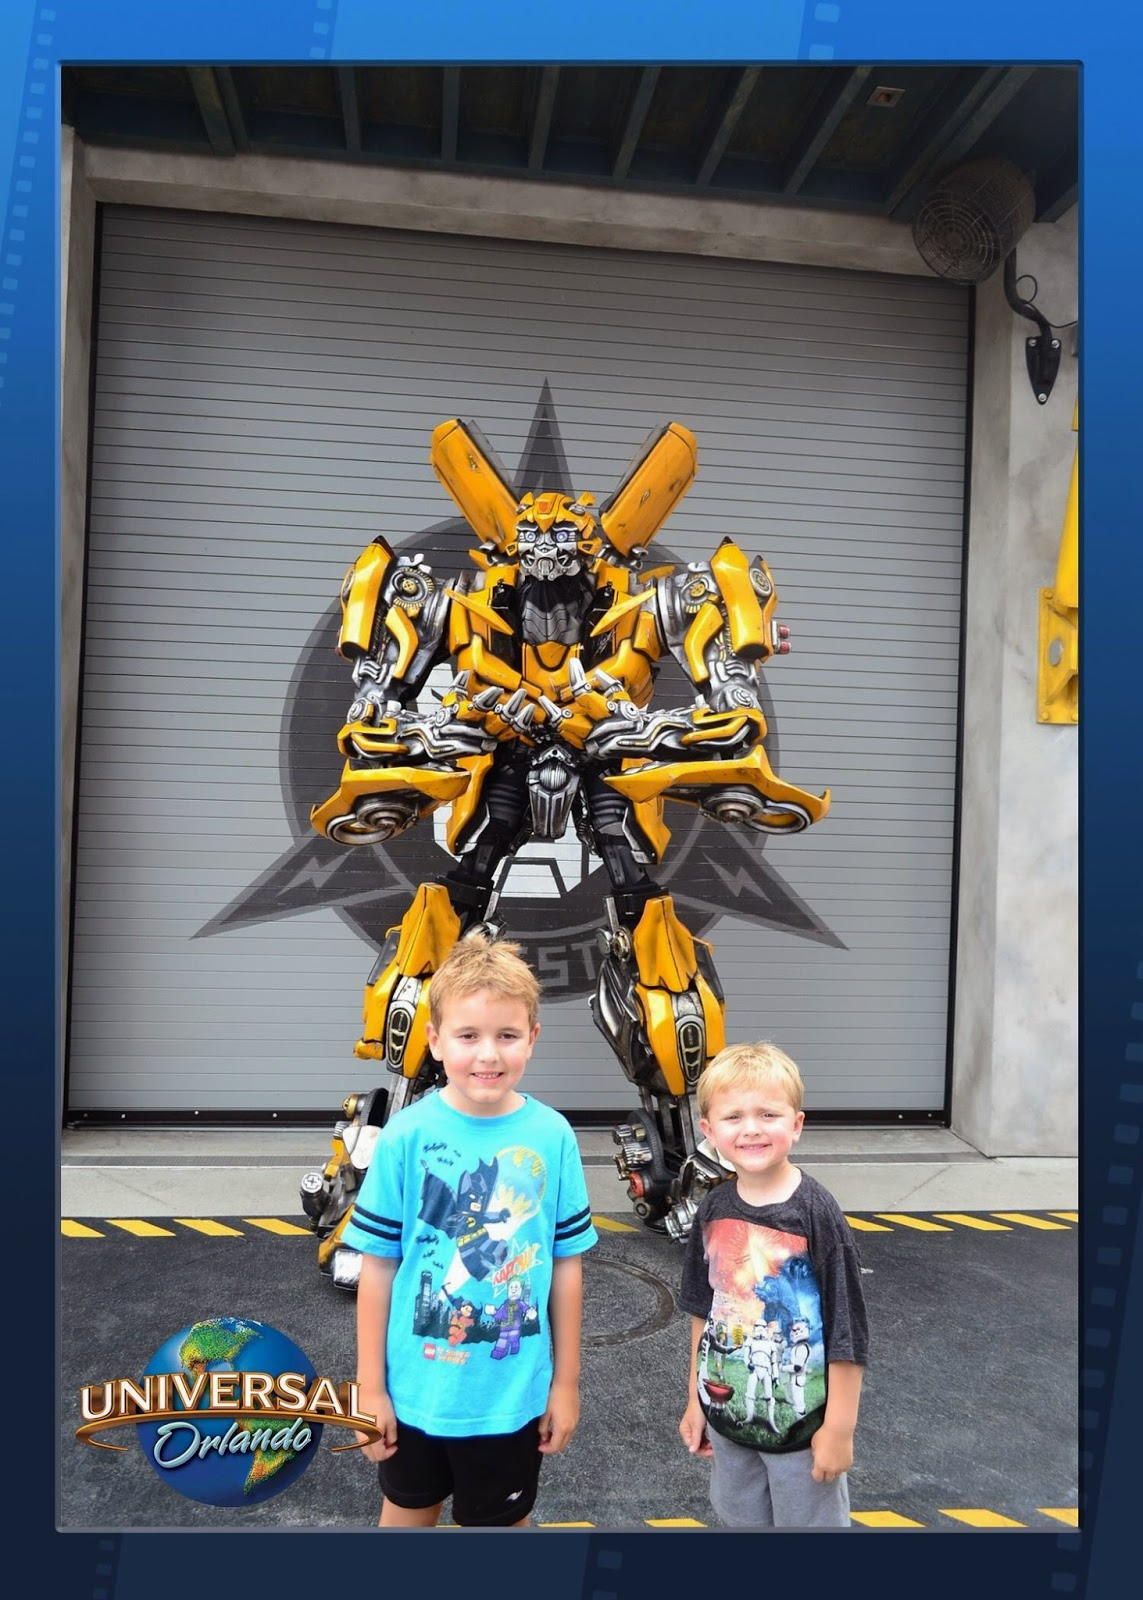 Transformers ride Universal Studios Orlando